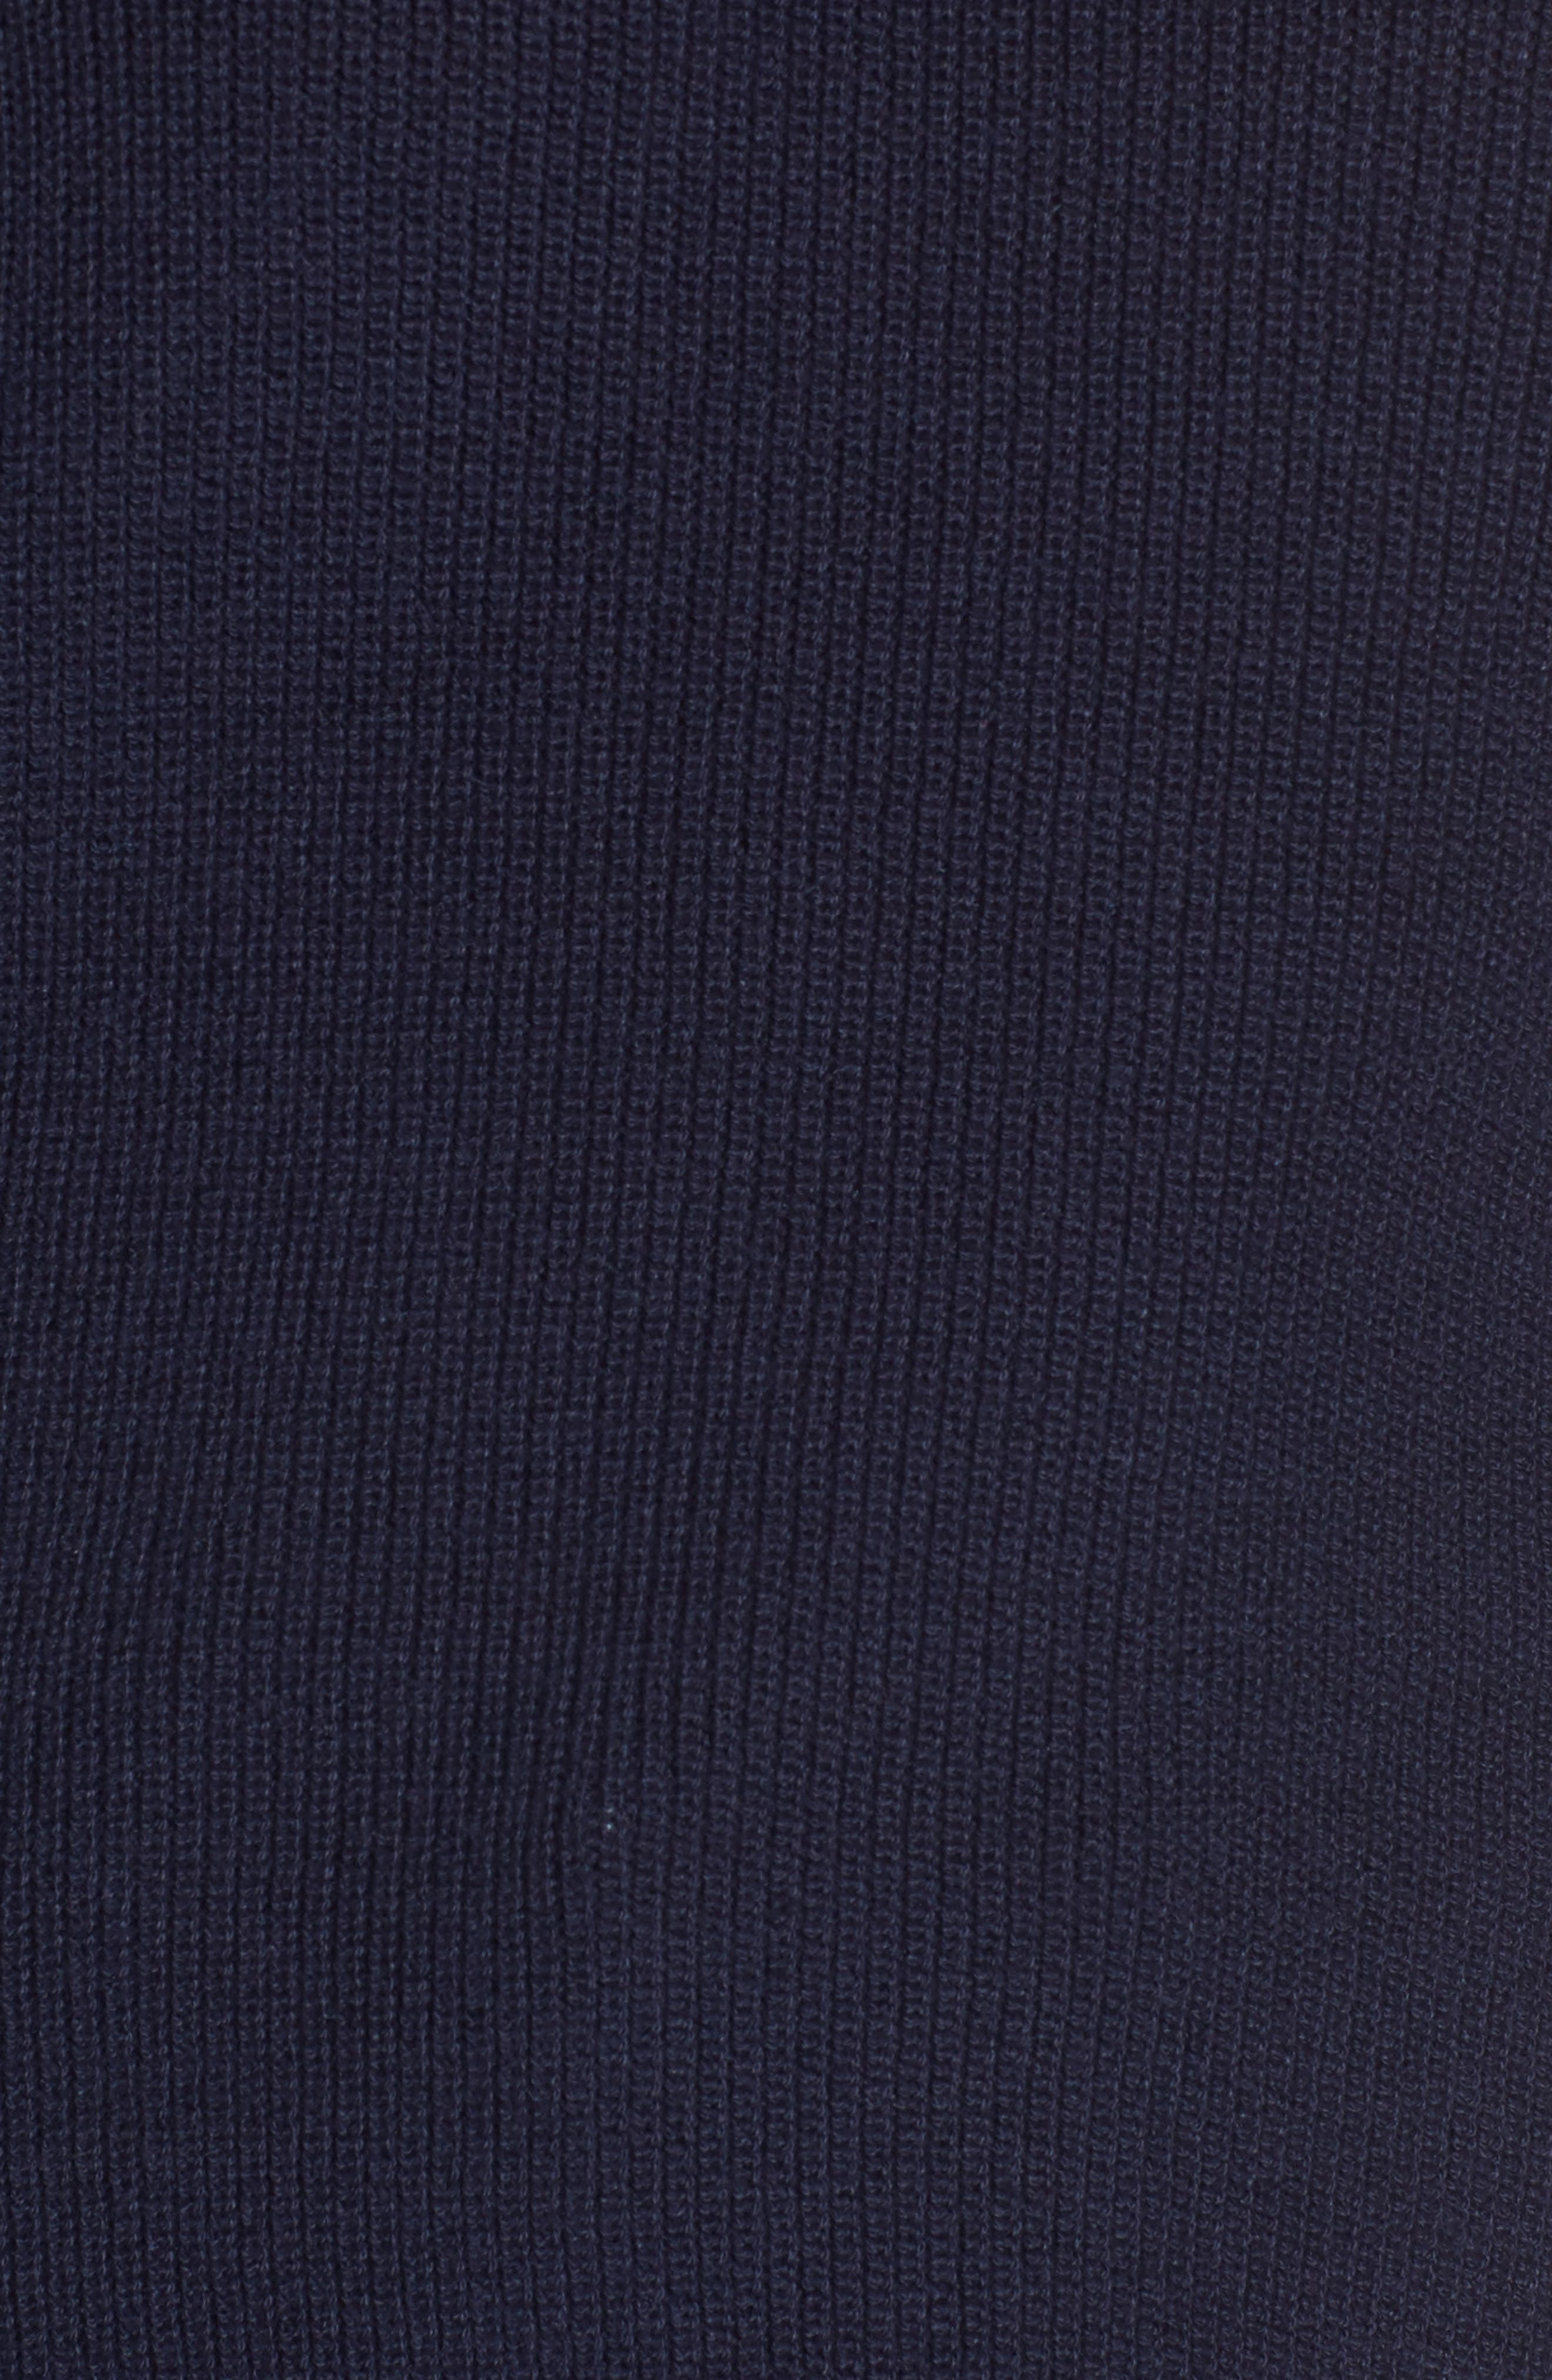 Drape Sleeve Sweater,                             Alternate thumbnail 5, color,                             Navy Evening